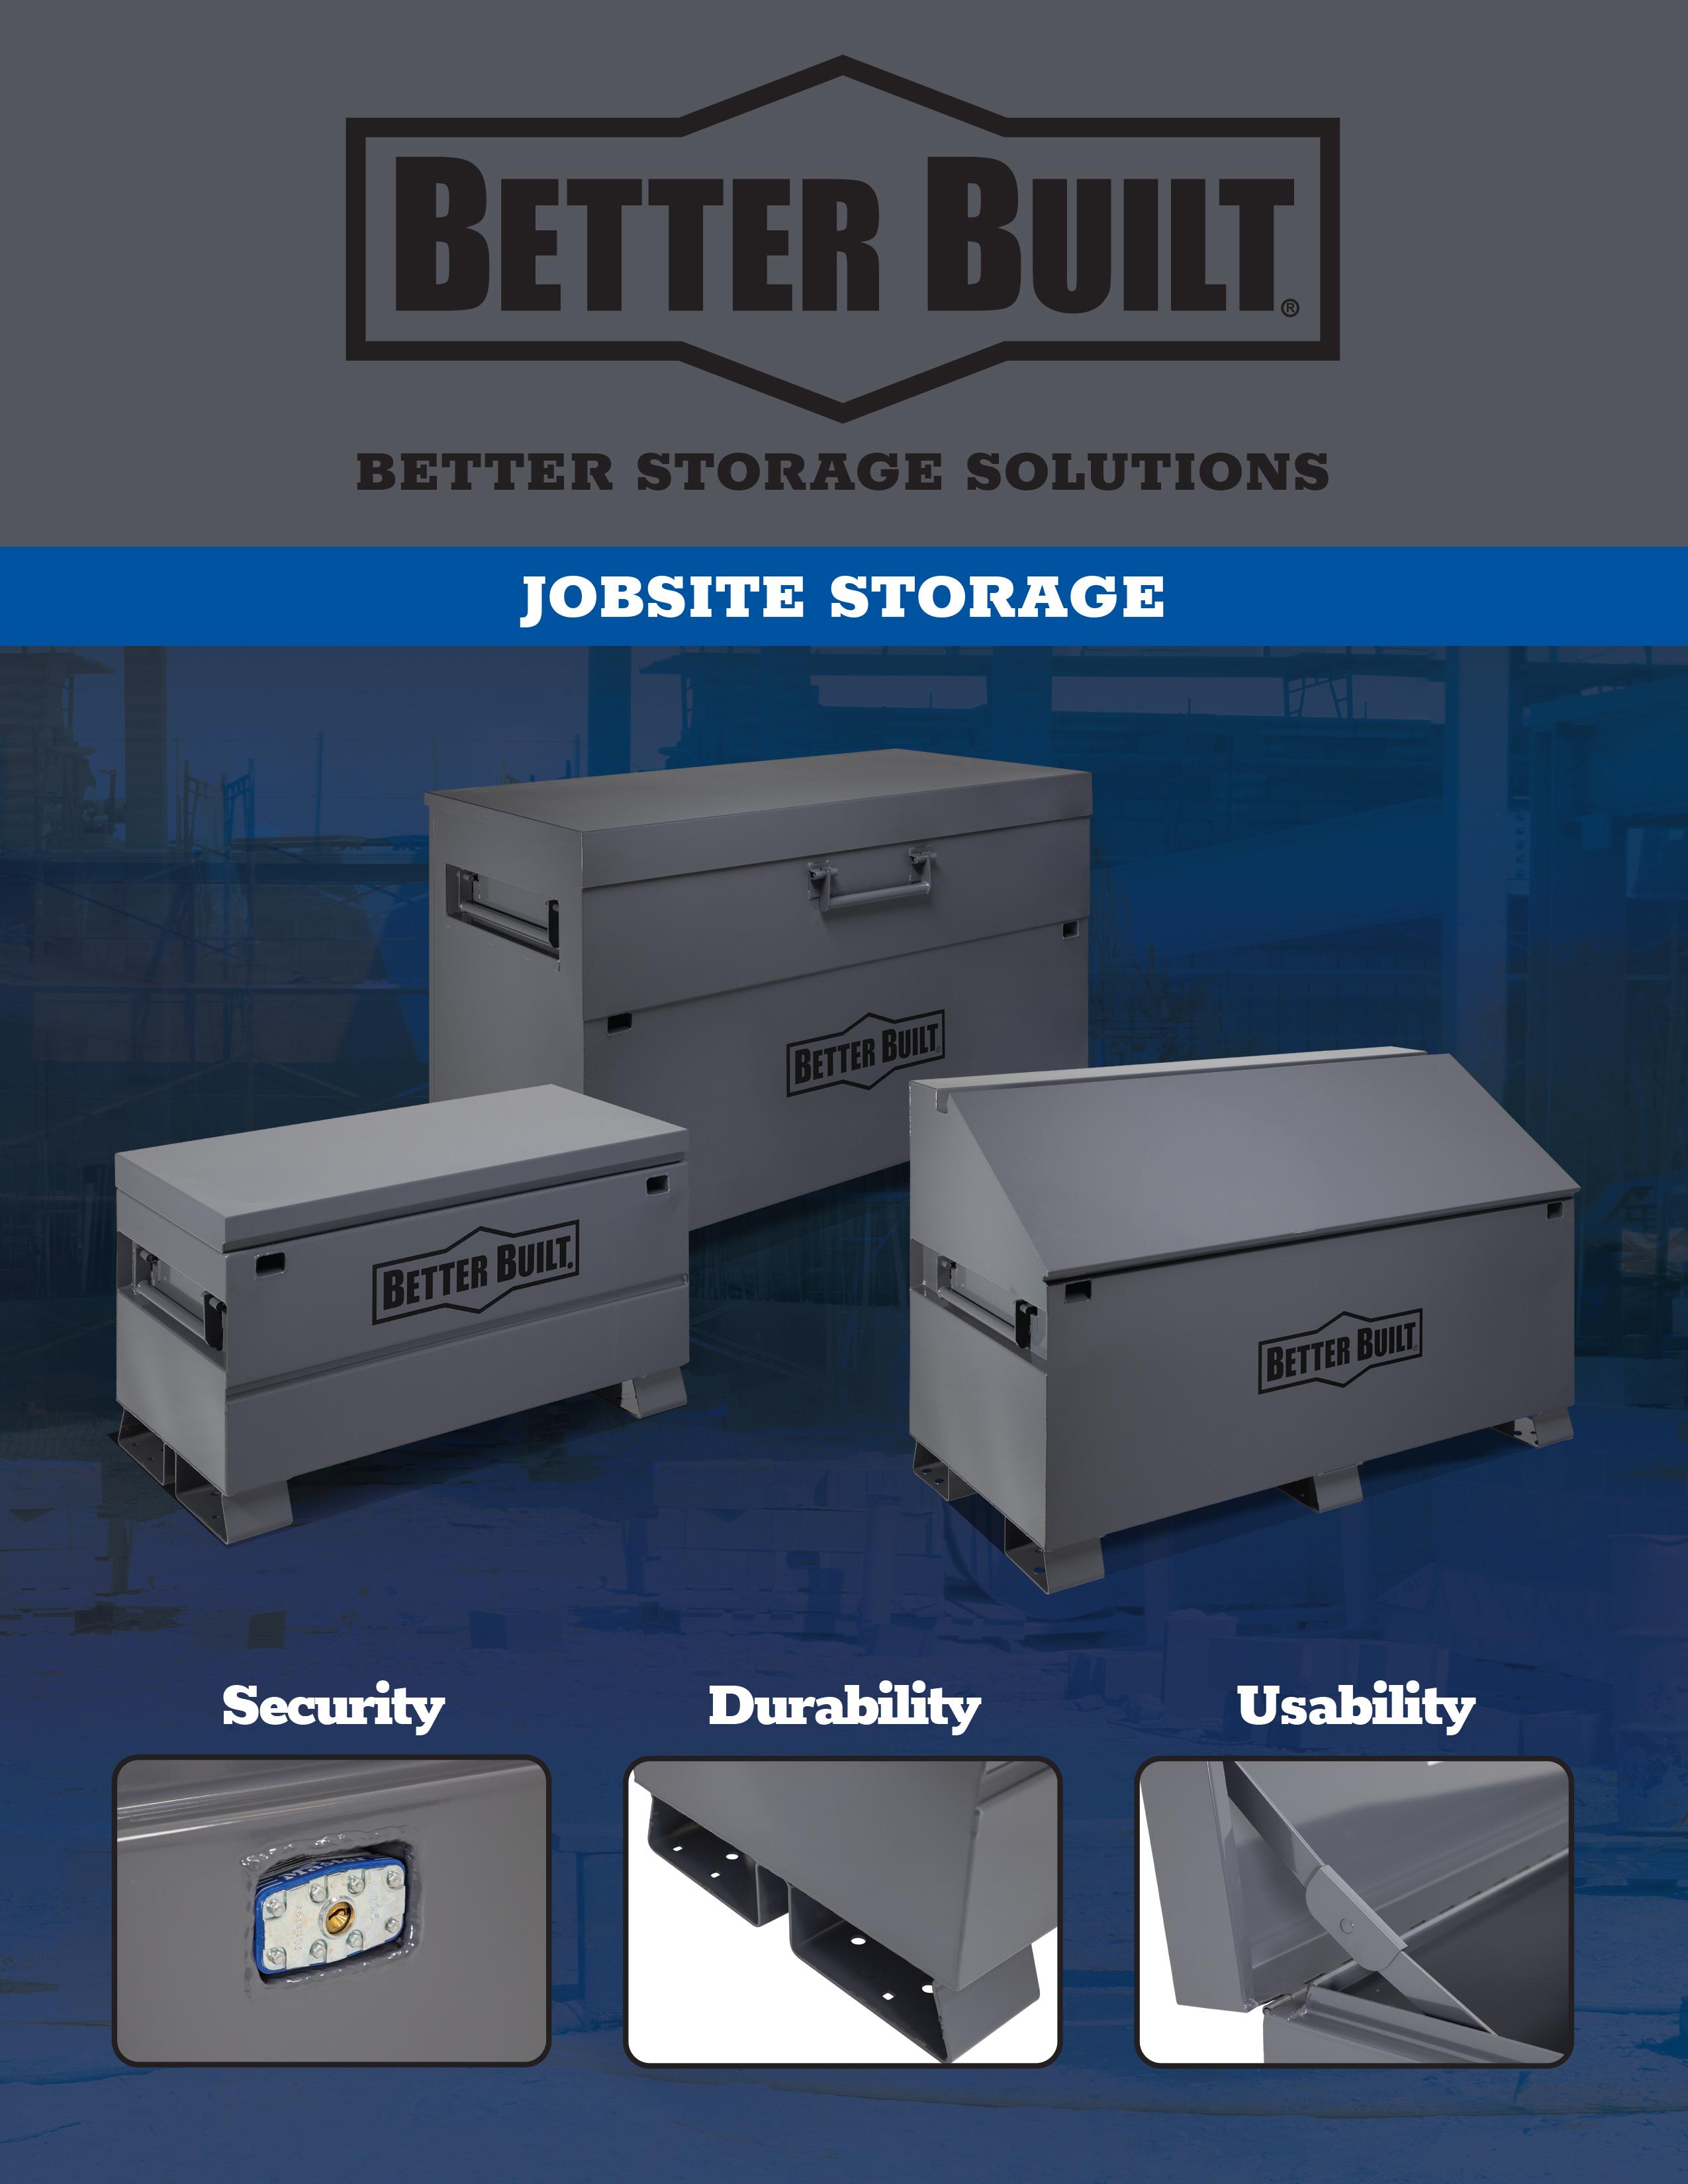 gm7690-bb-jobsitebox-ss-hires-1.jpg